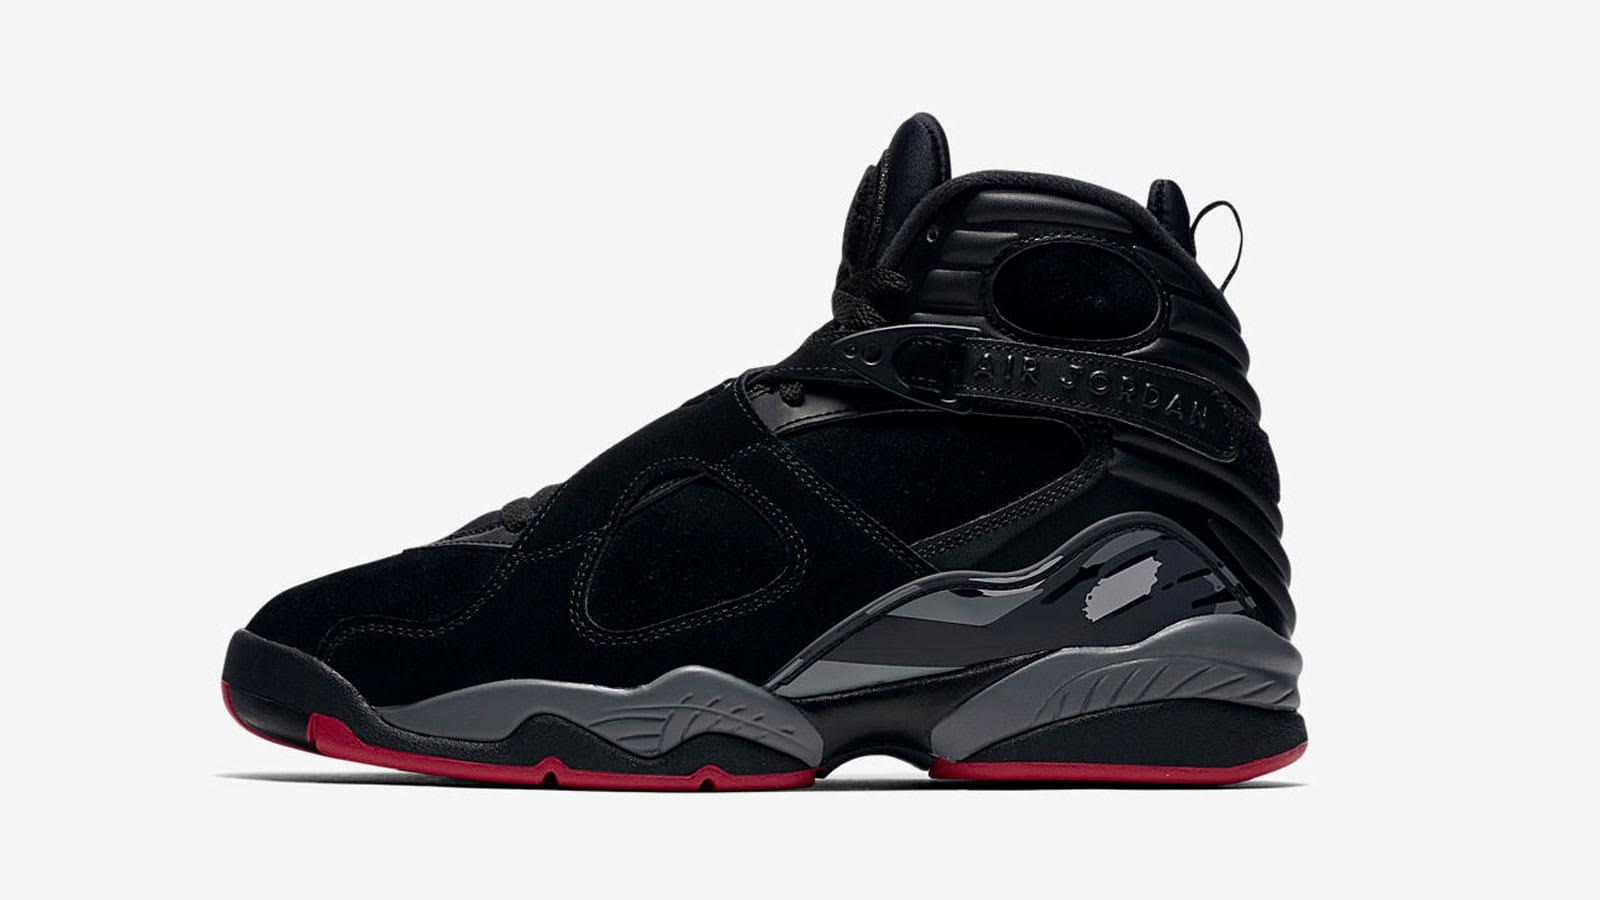 Air Jordan 8 Retro 'Cement Black